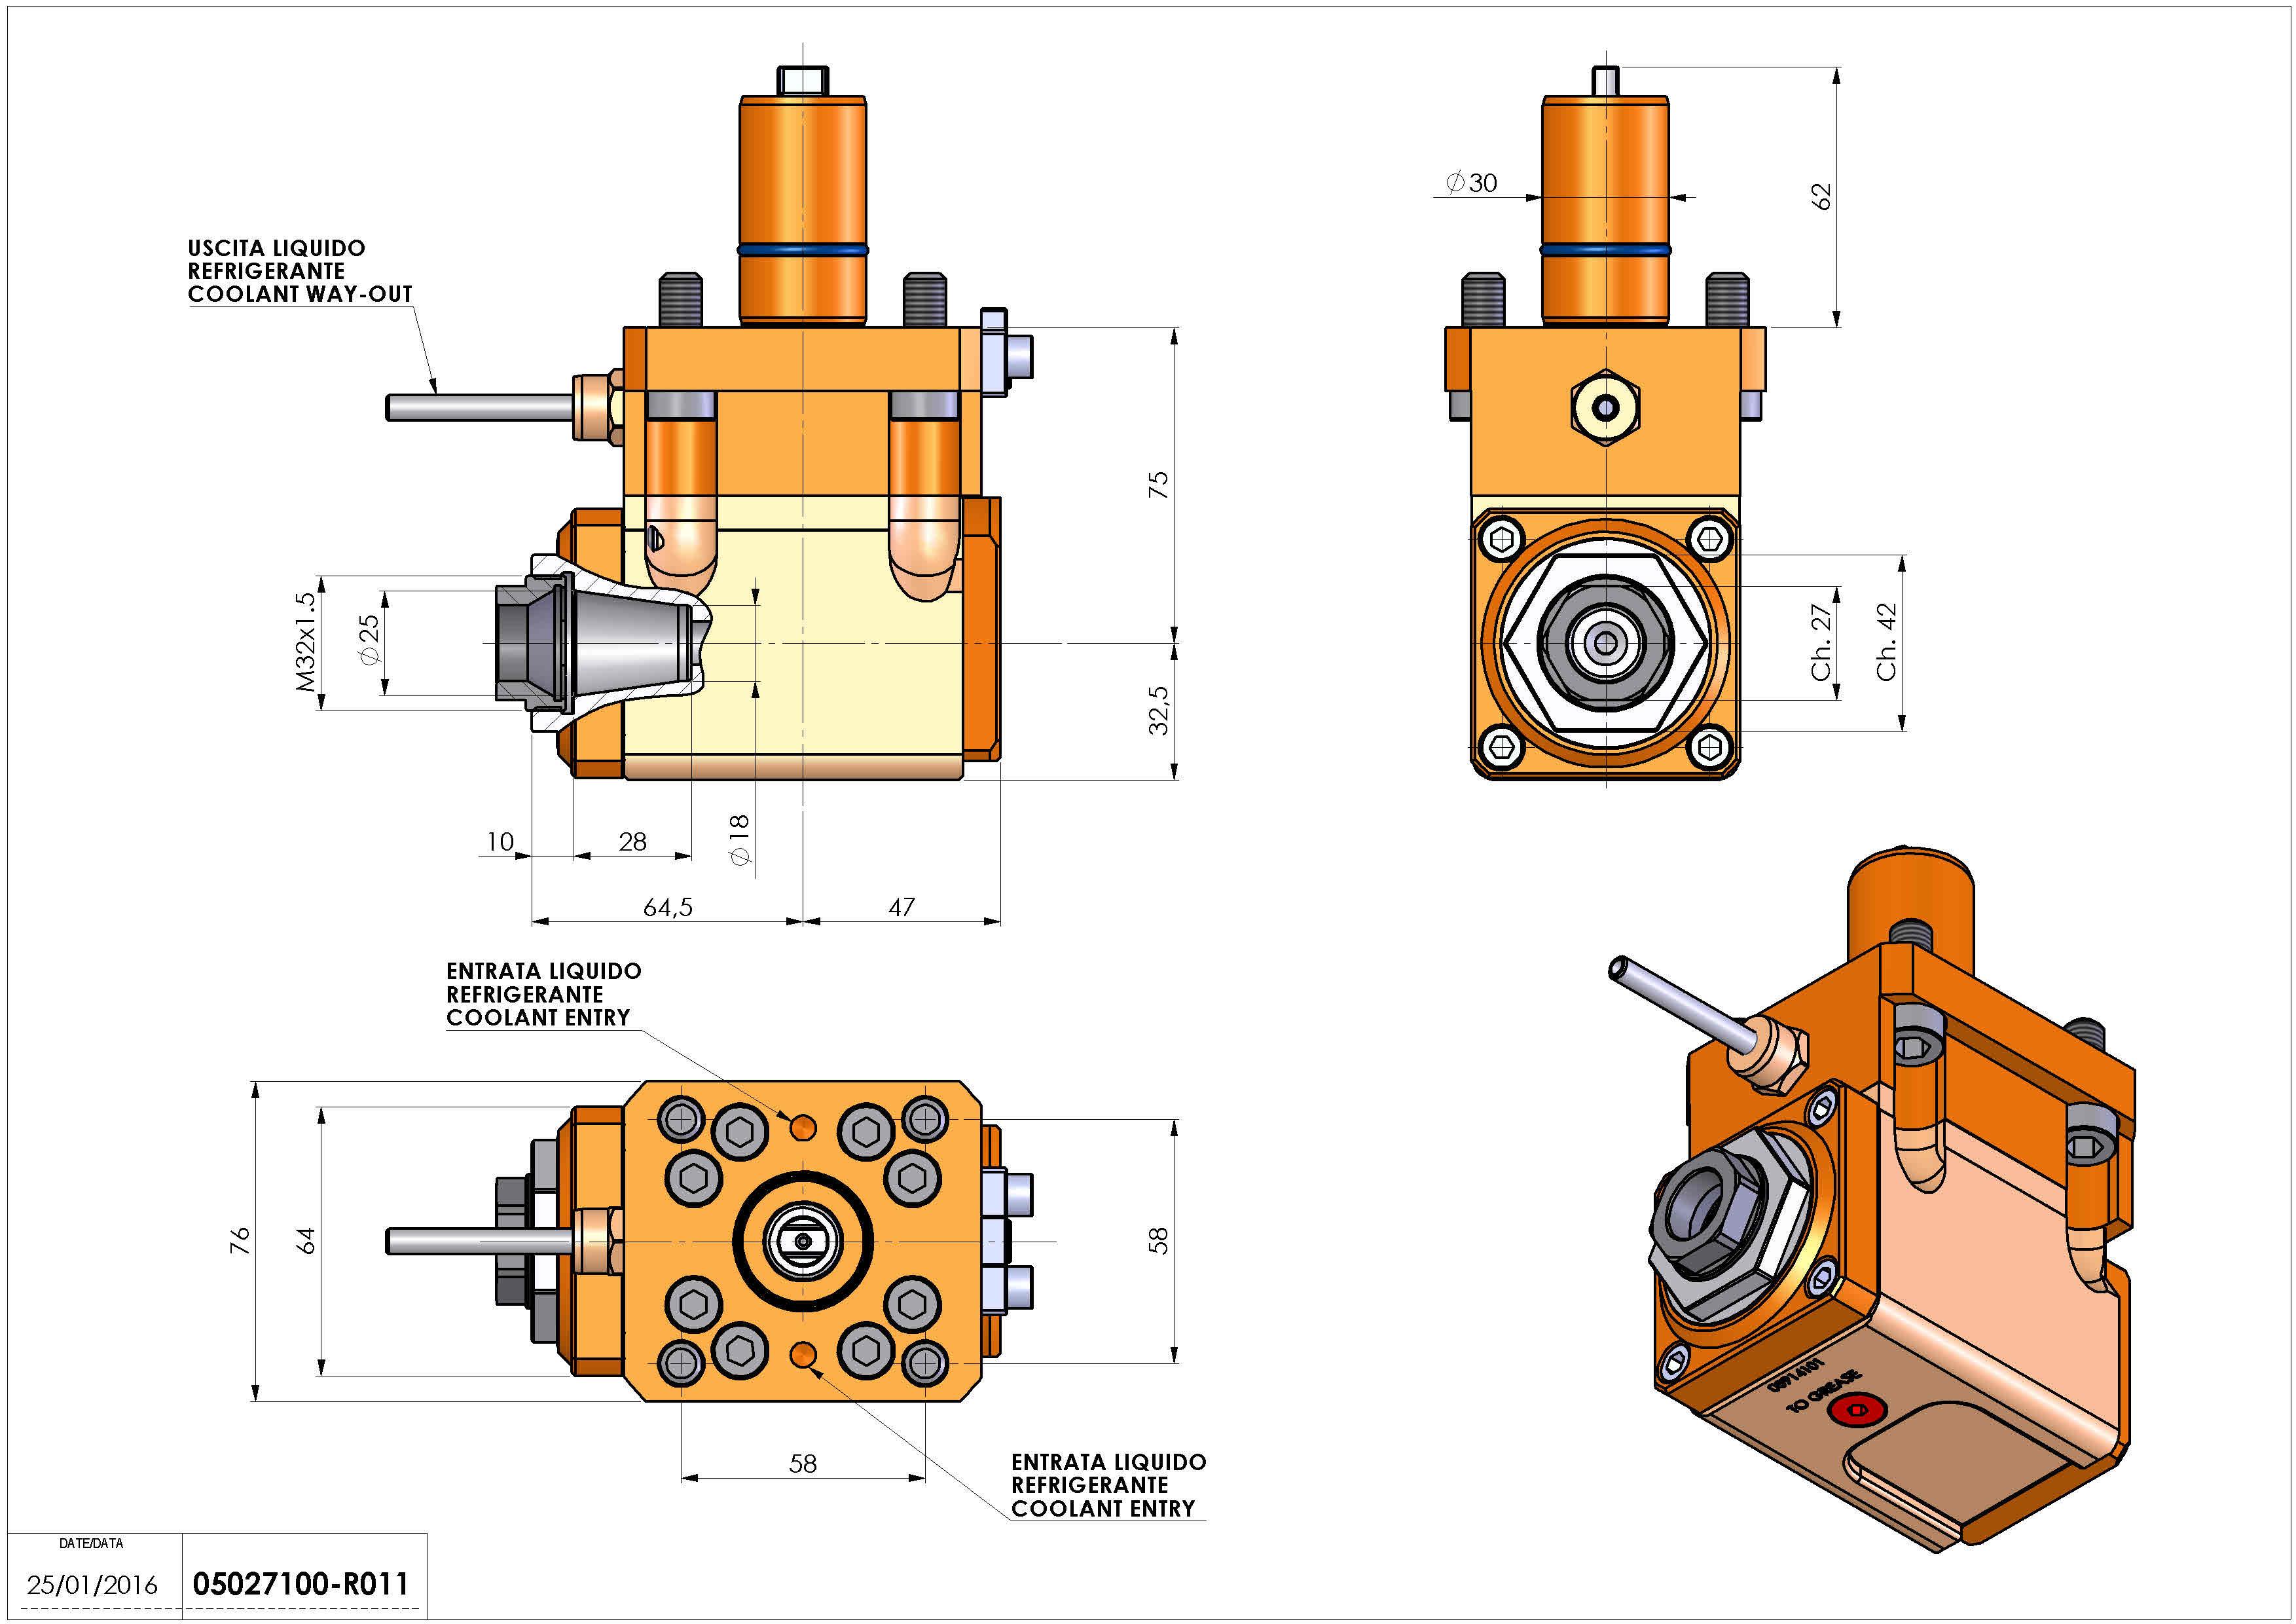 Technical image - LT-A D30 ER25F LR H75 TZ.